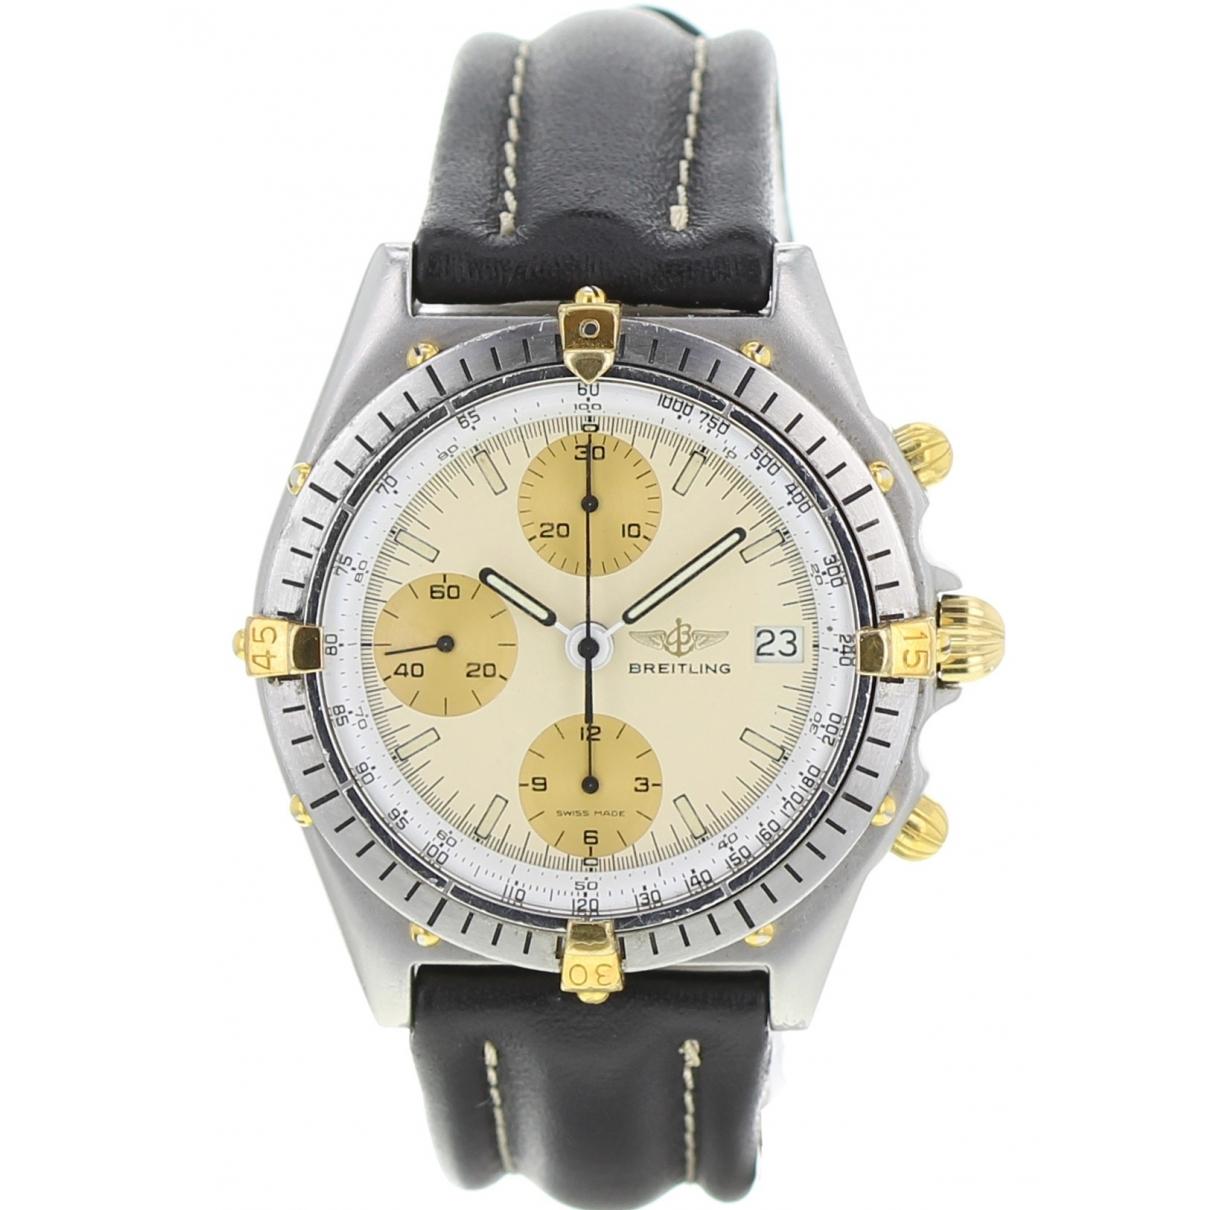 Breitling \N Black gold and steel watch for Men \N